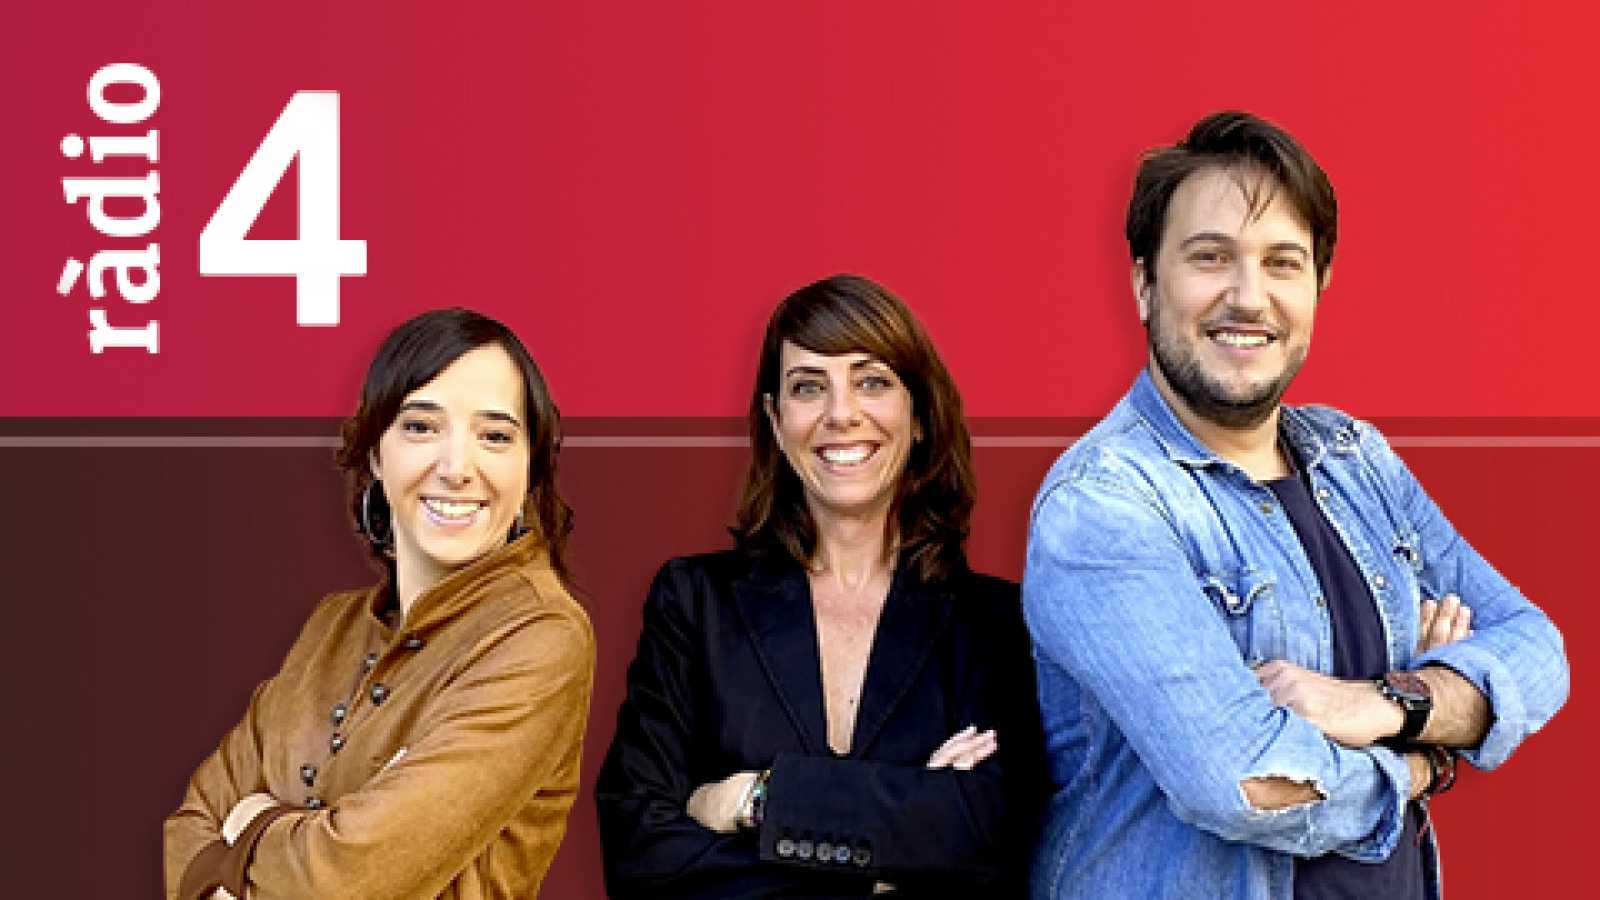 En Directe a Ràdio 4 - Segona hora - 22/02/21